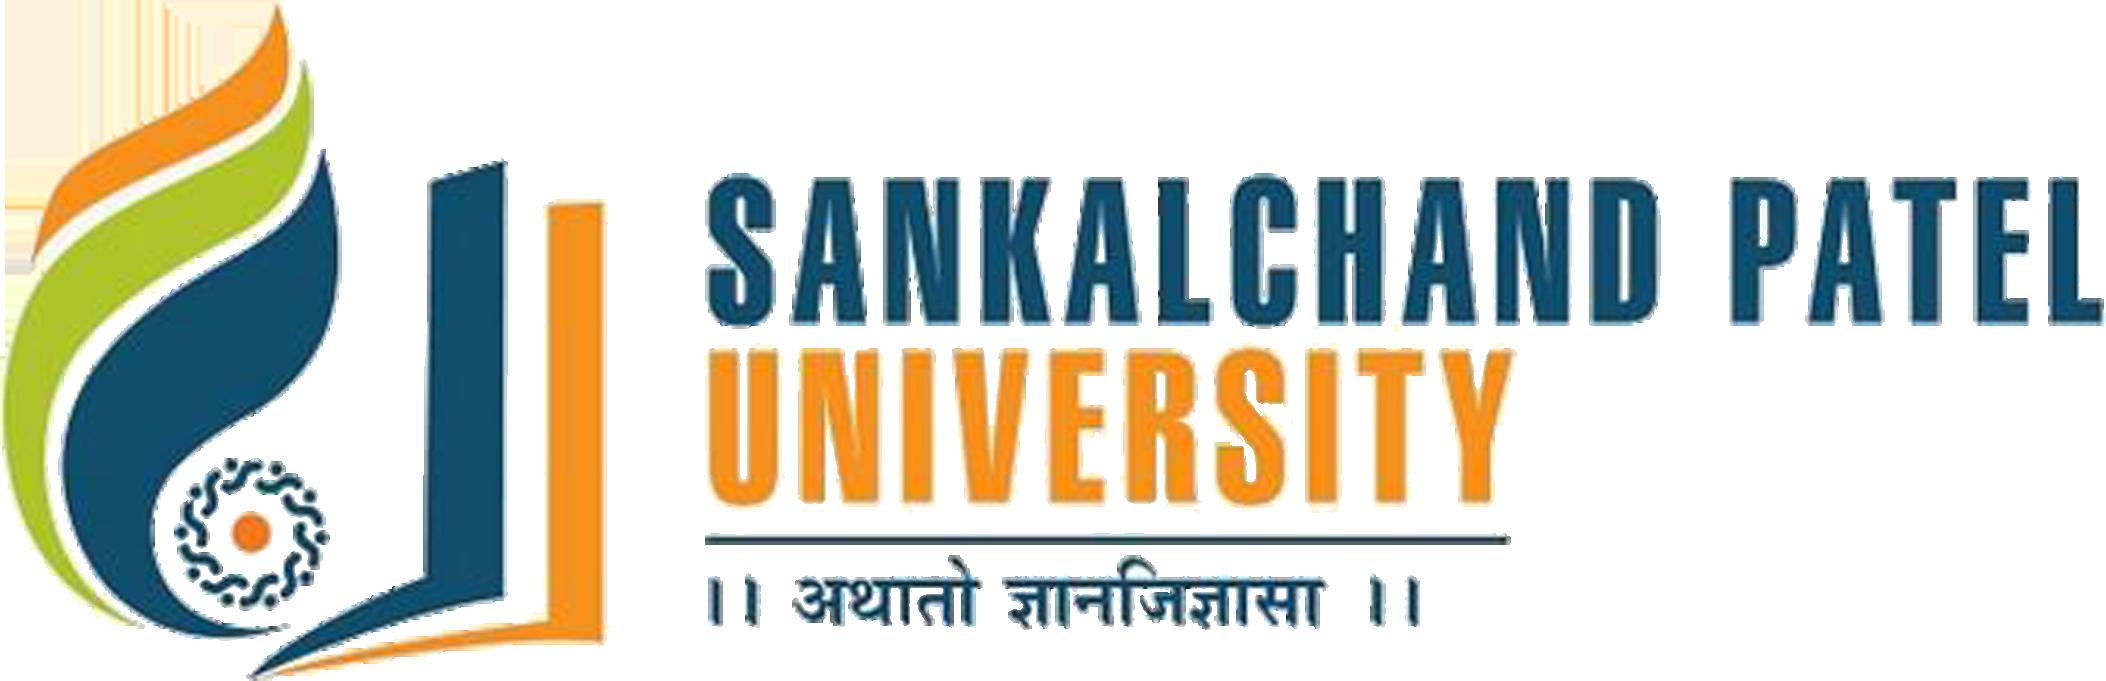 SPU Logo